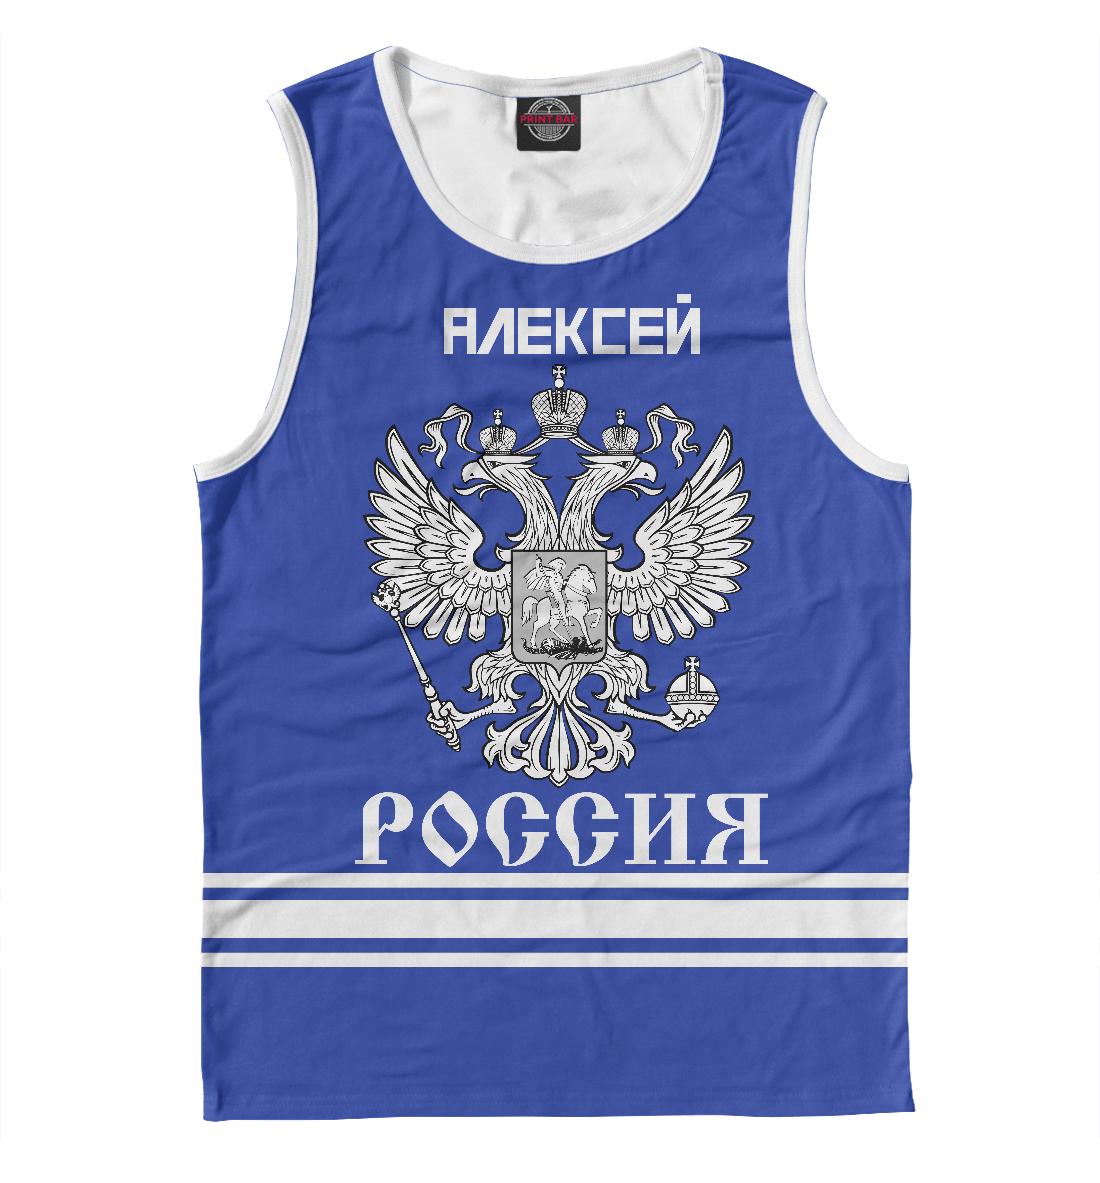 АЛЕКСЕЙ sport russia collection, Printbar, Майки, ALE-271441-may-2  - купить со скидкой